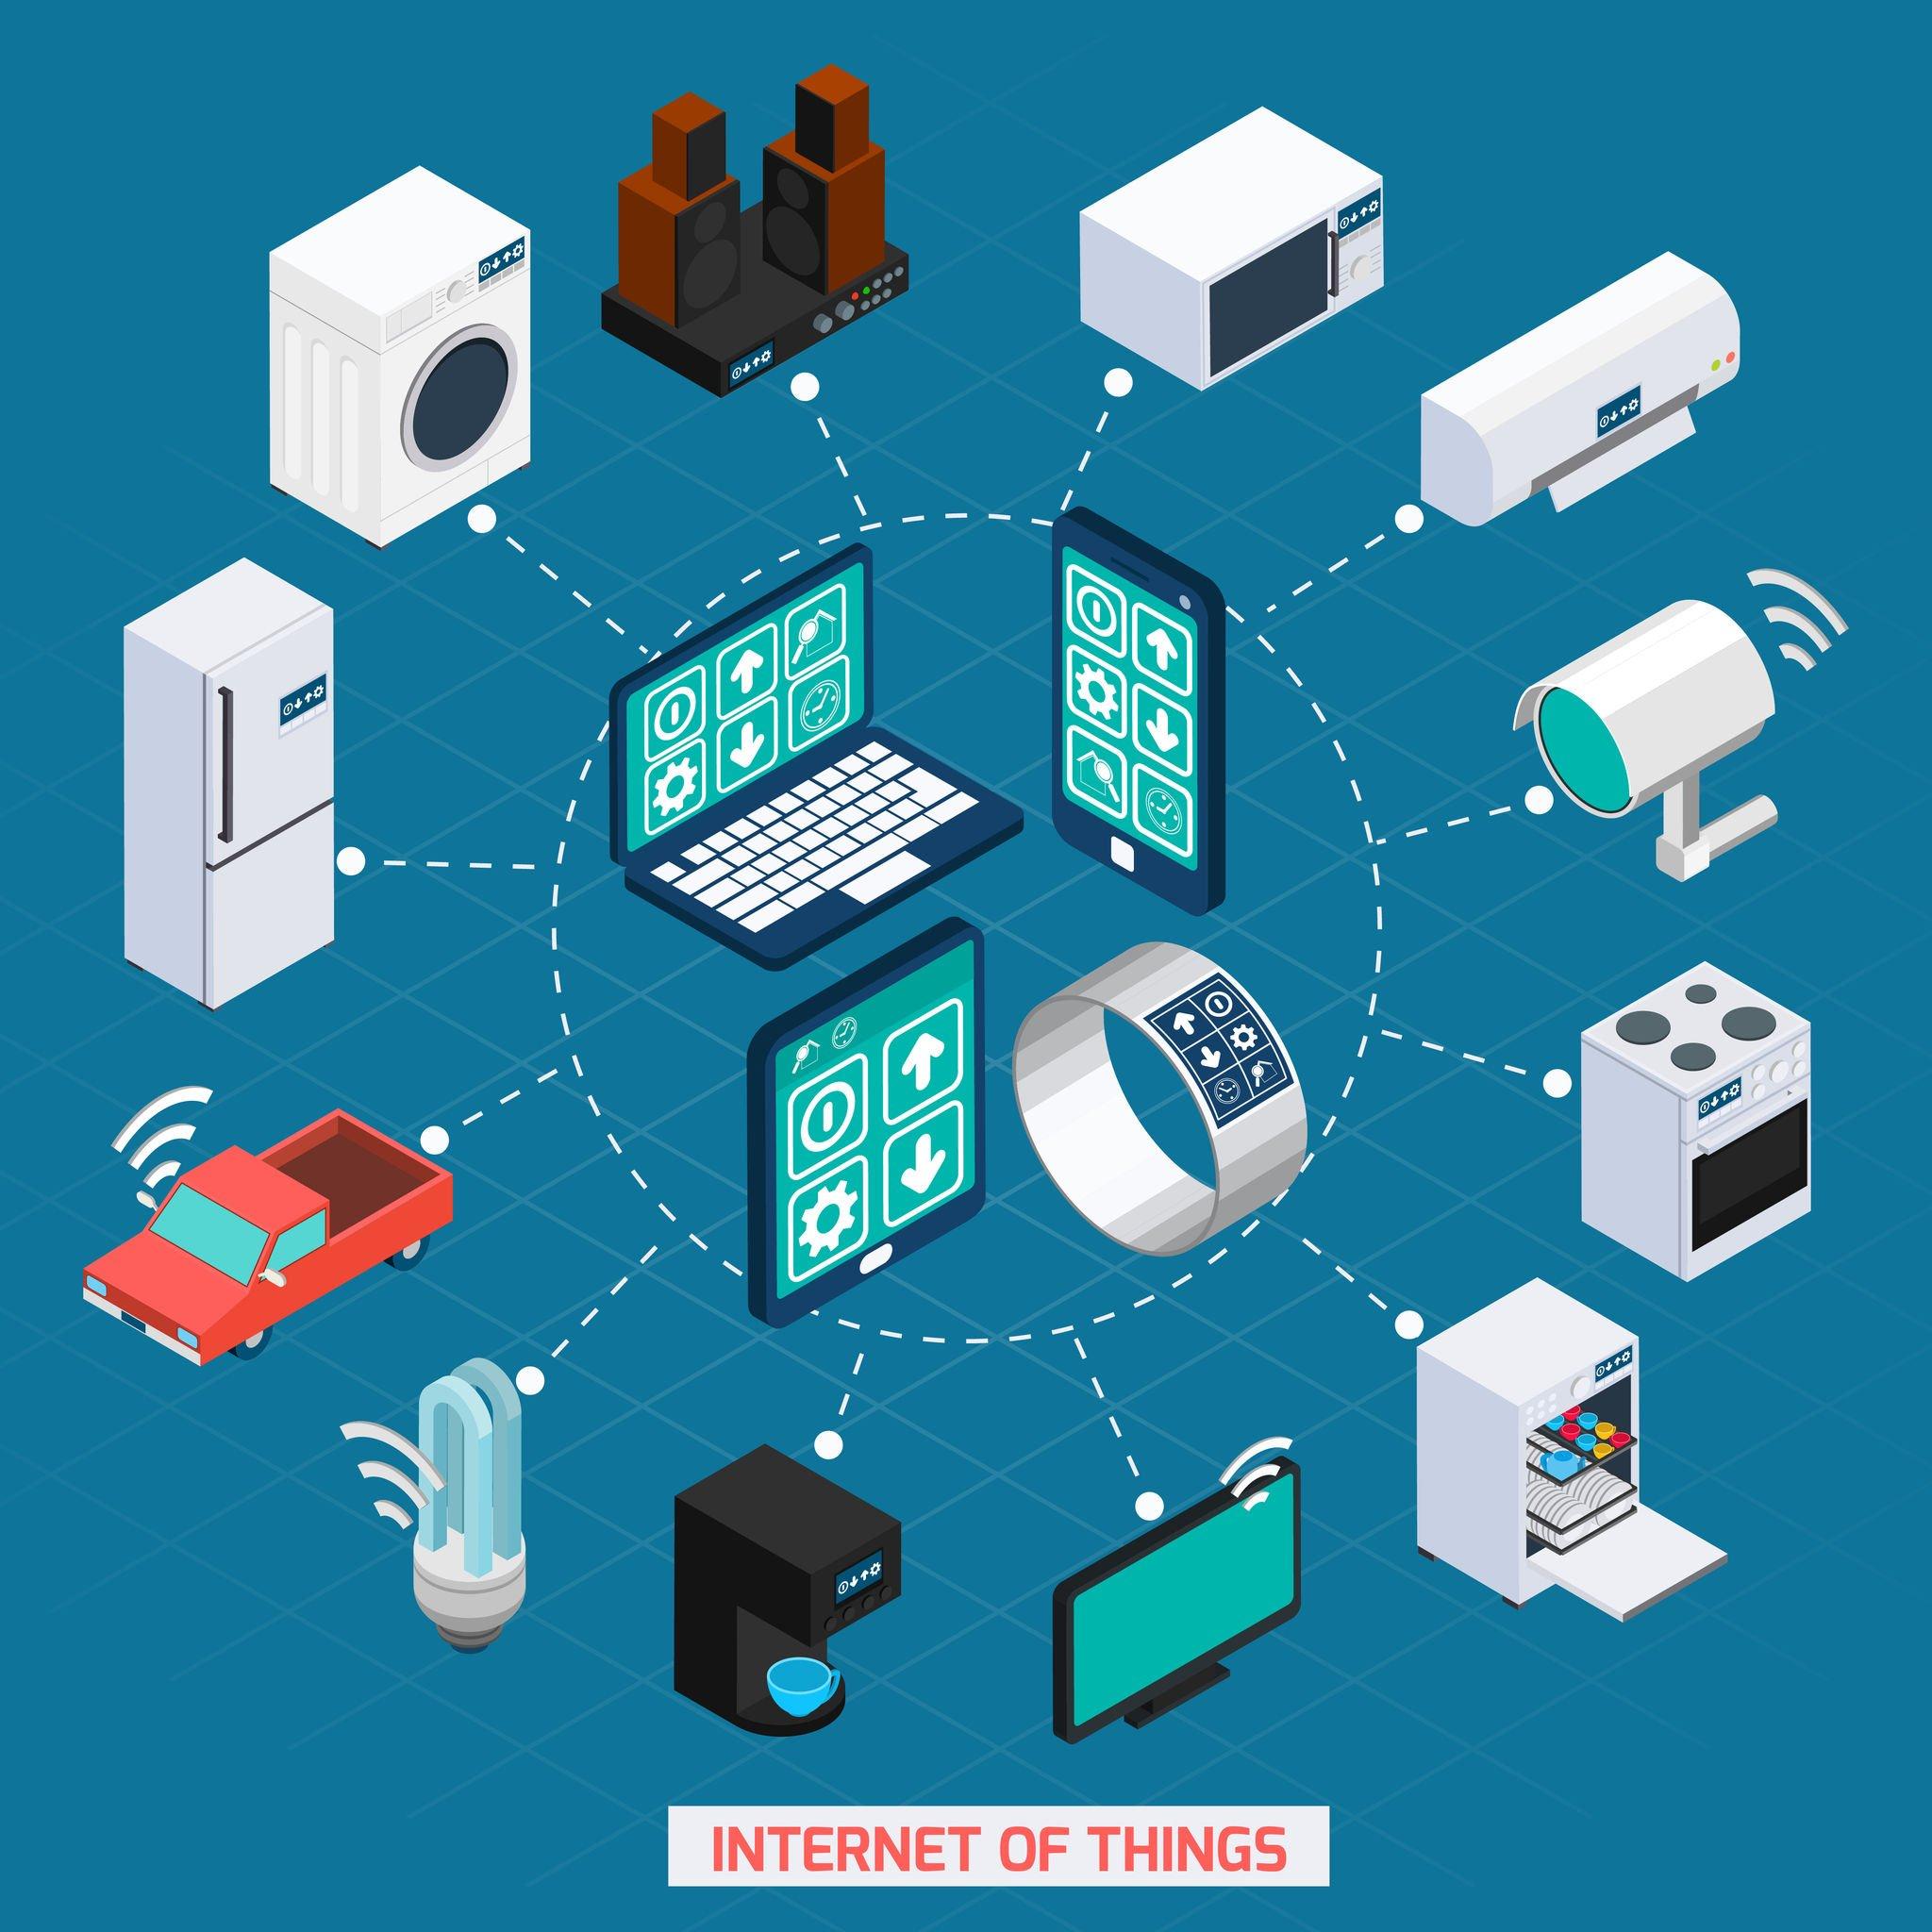 IOT, Internet of Things